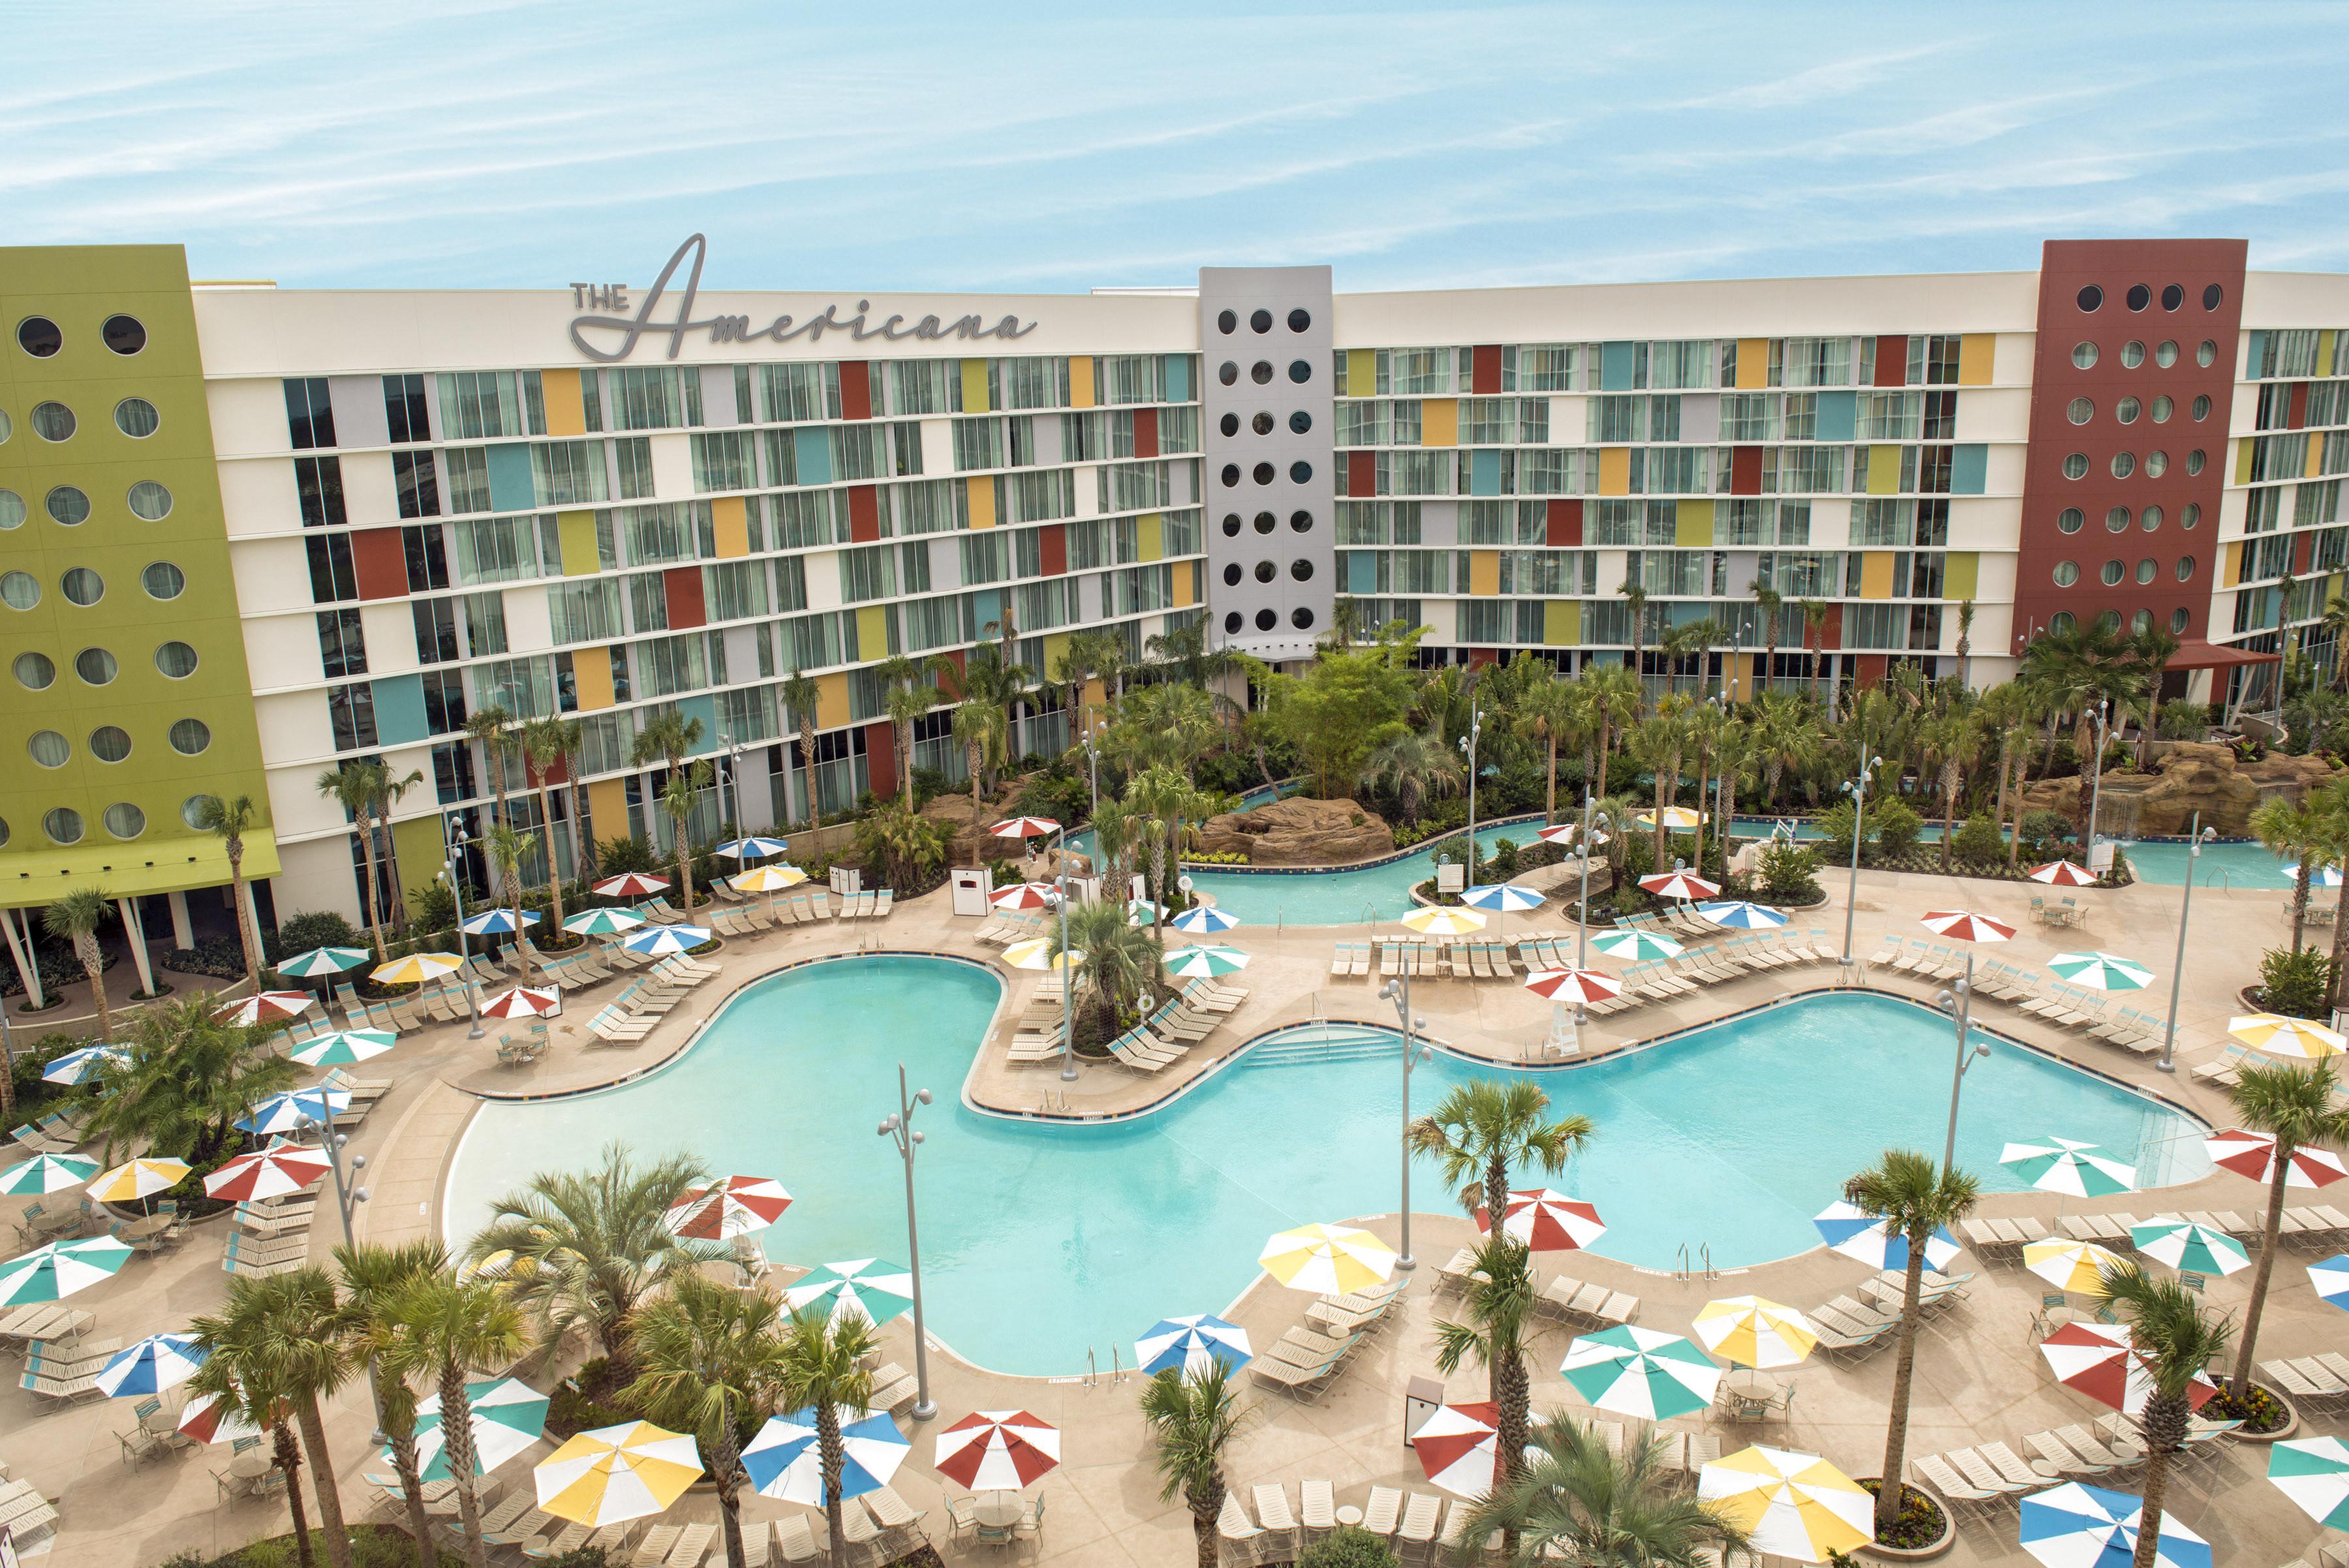 Universals Orlando Cabana Bay